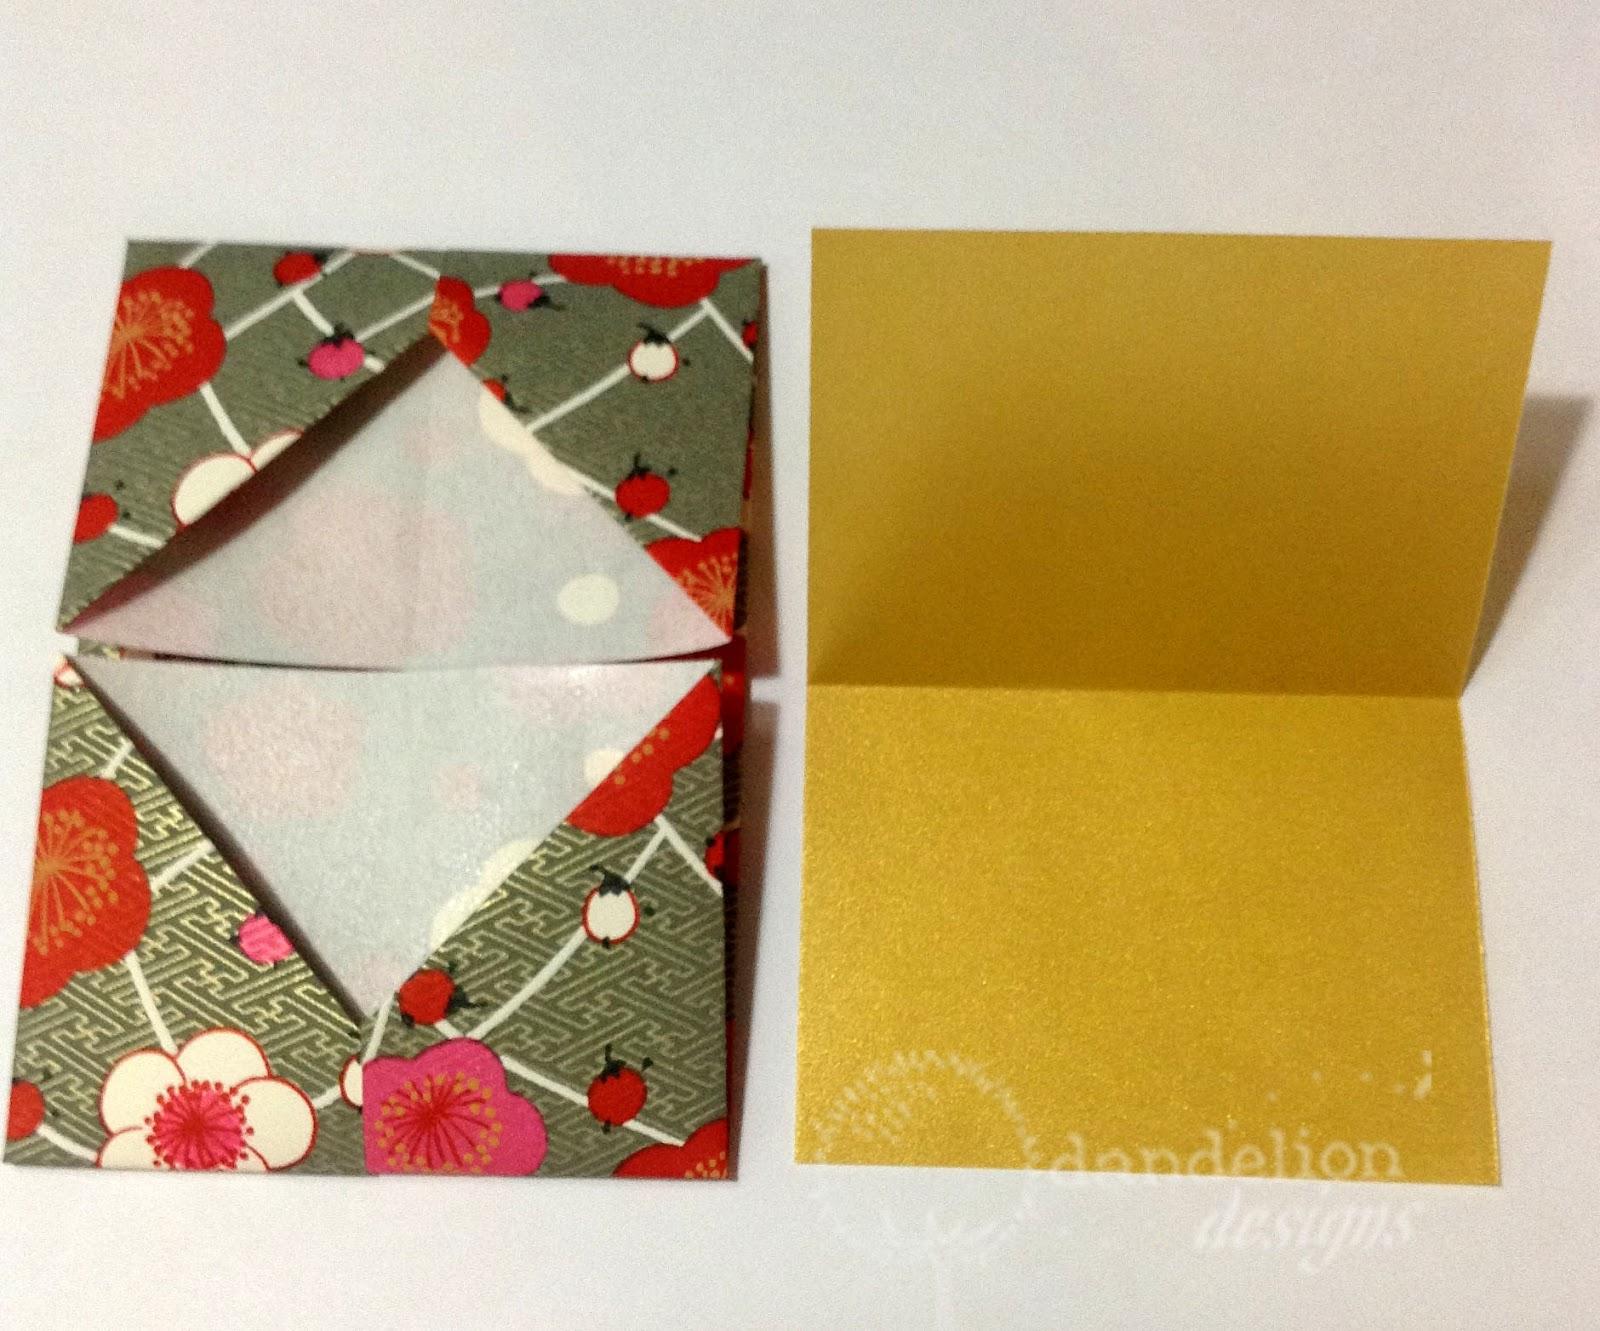 dandelion designs origami gift card holders